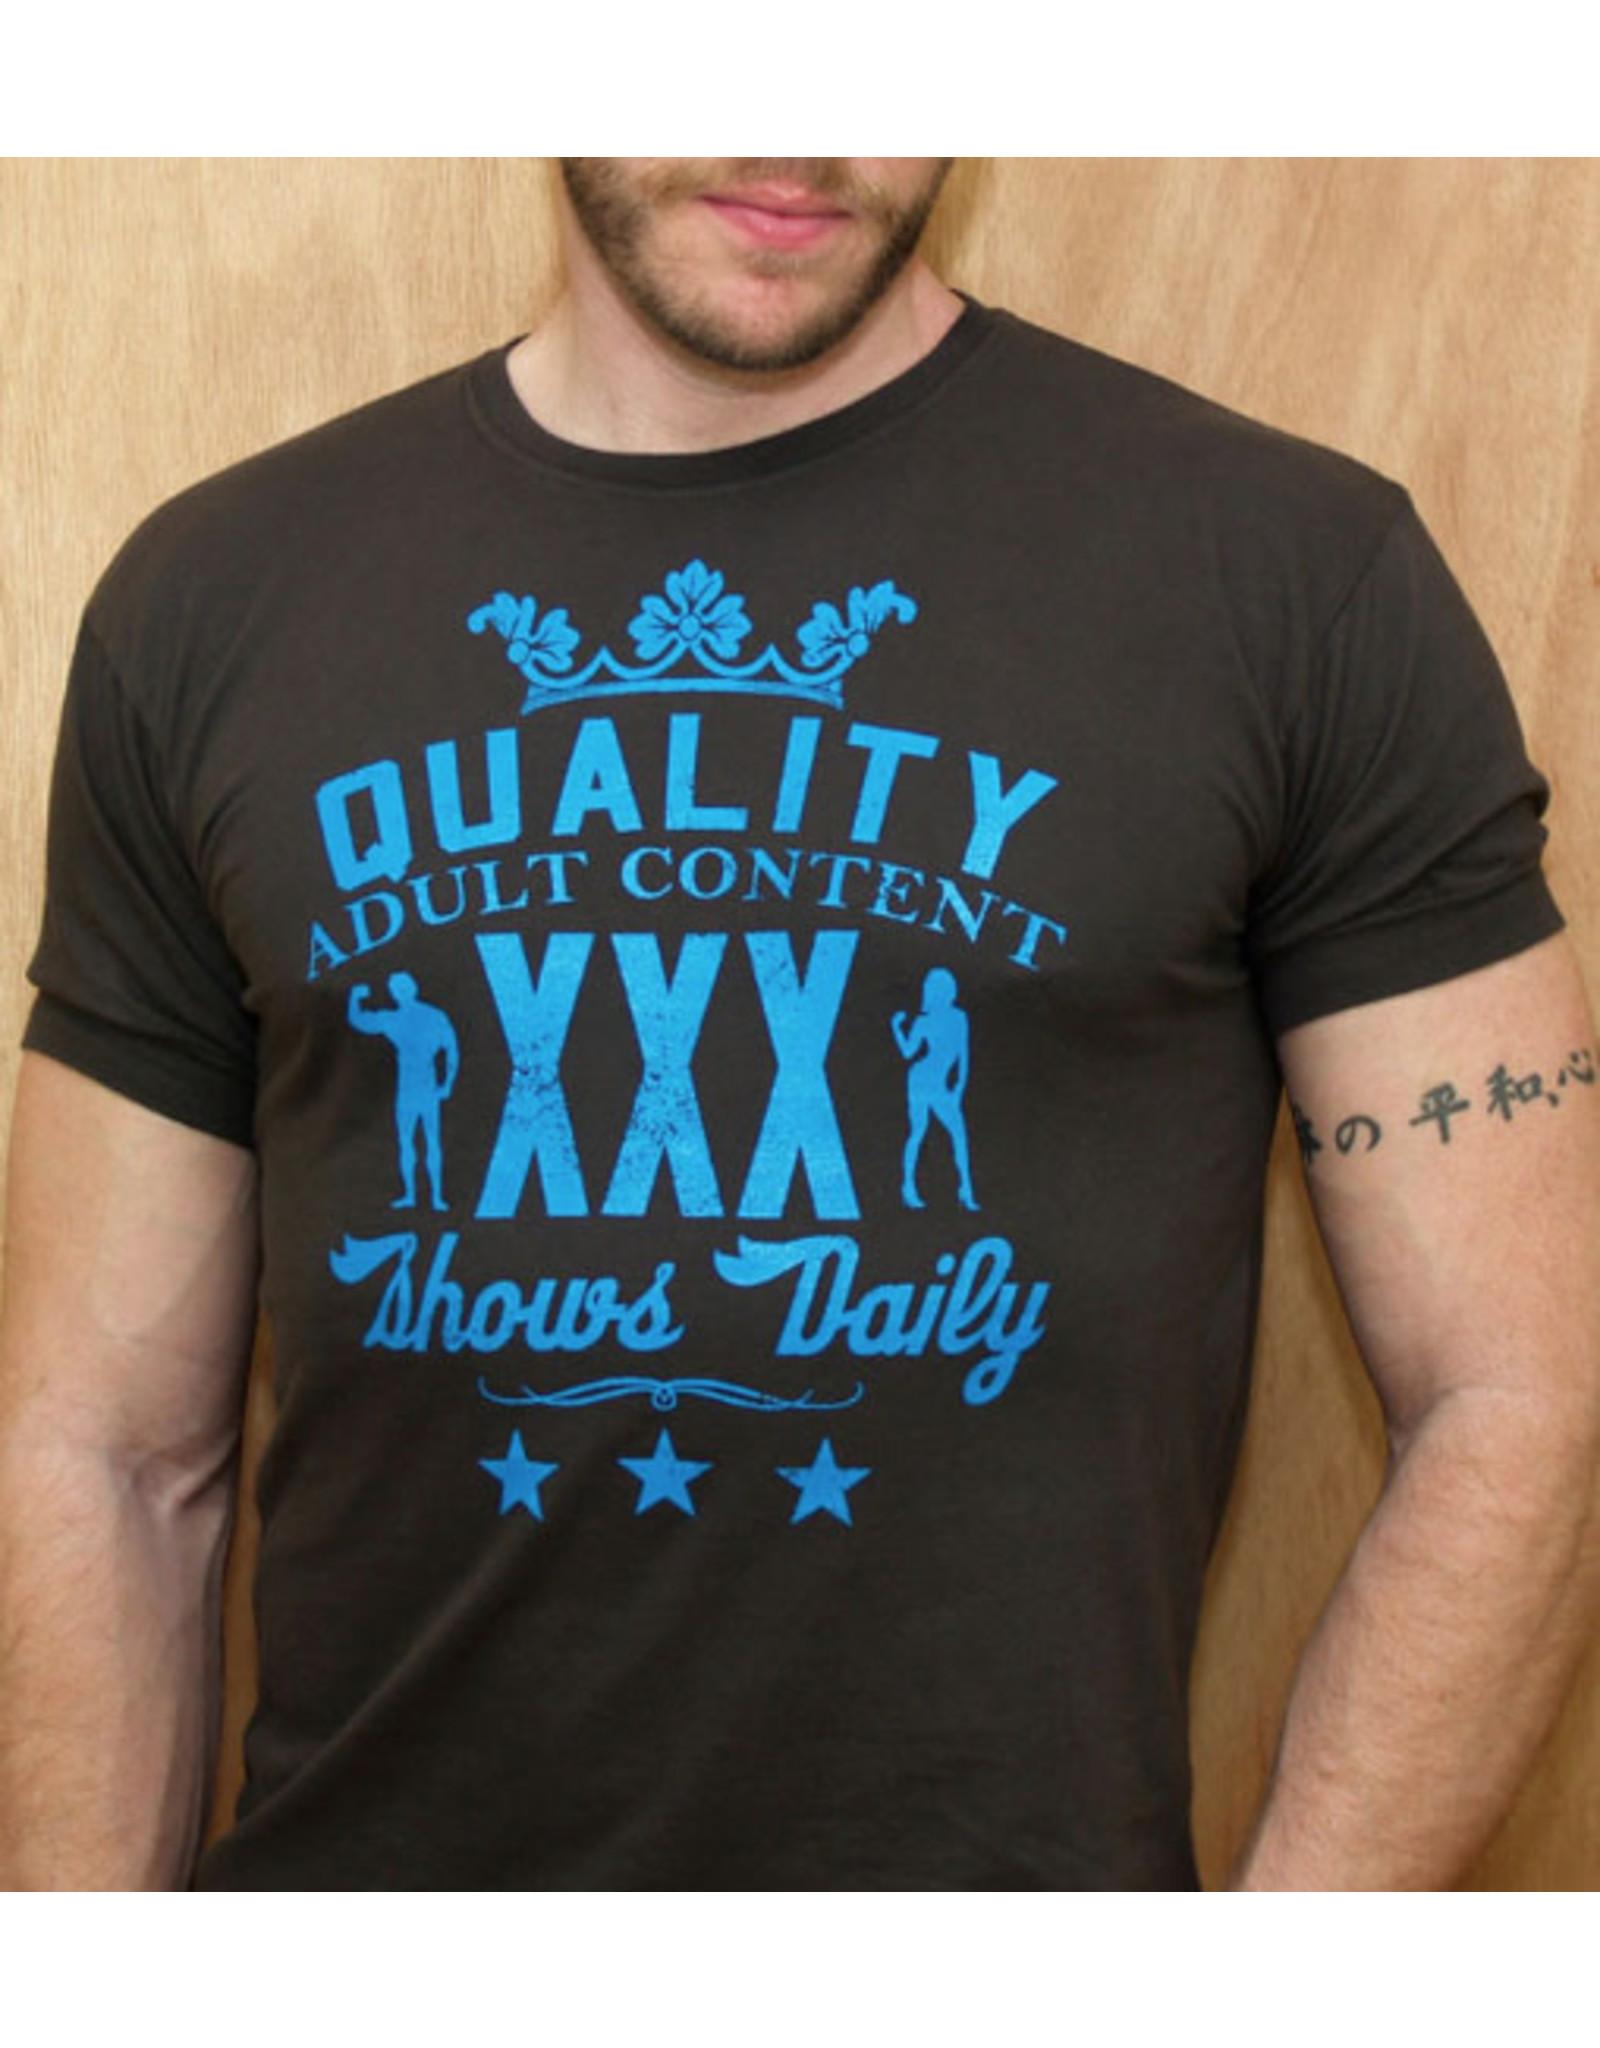 ajaxx63 ajaxx63 Quality Adult Content Tee